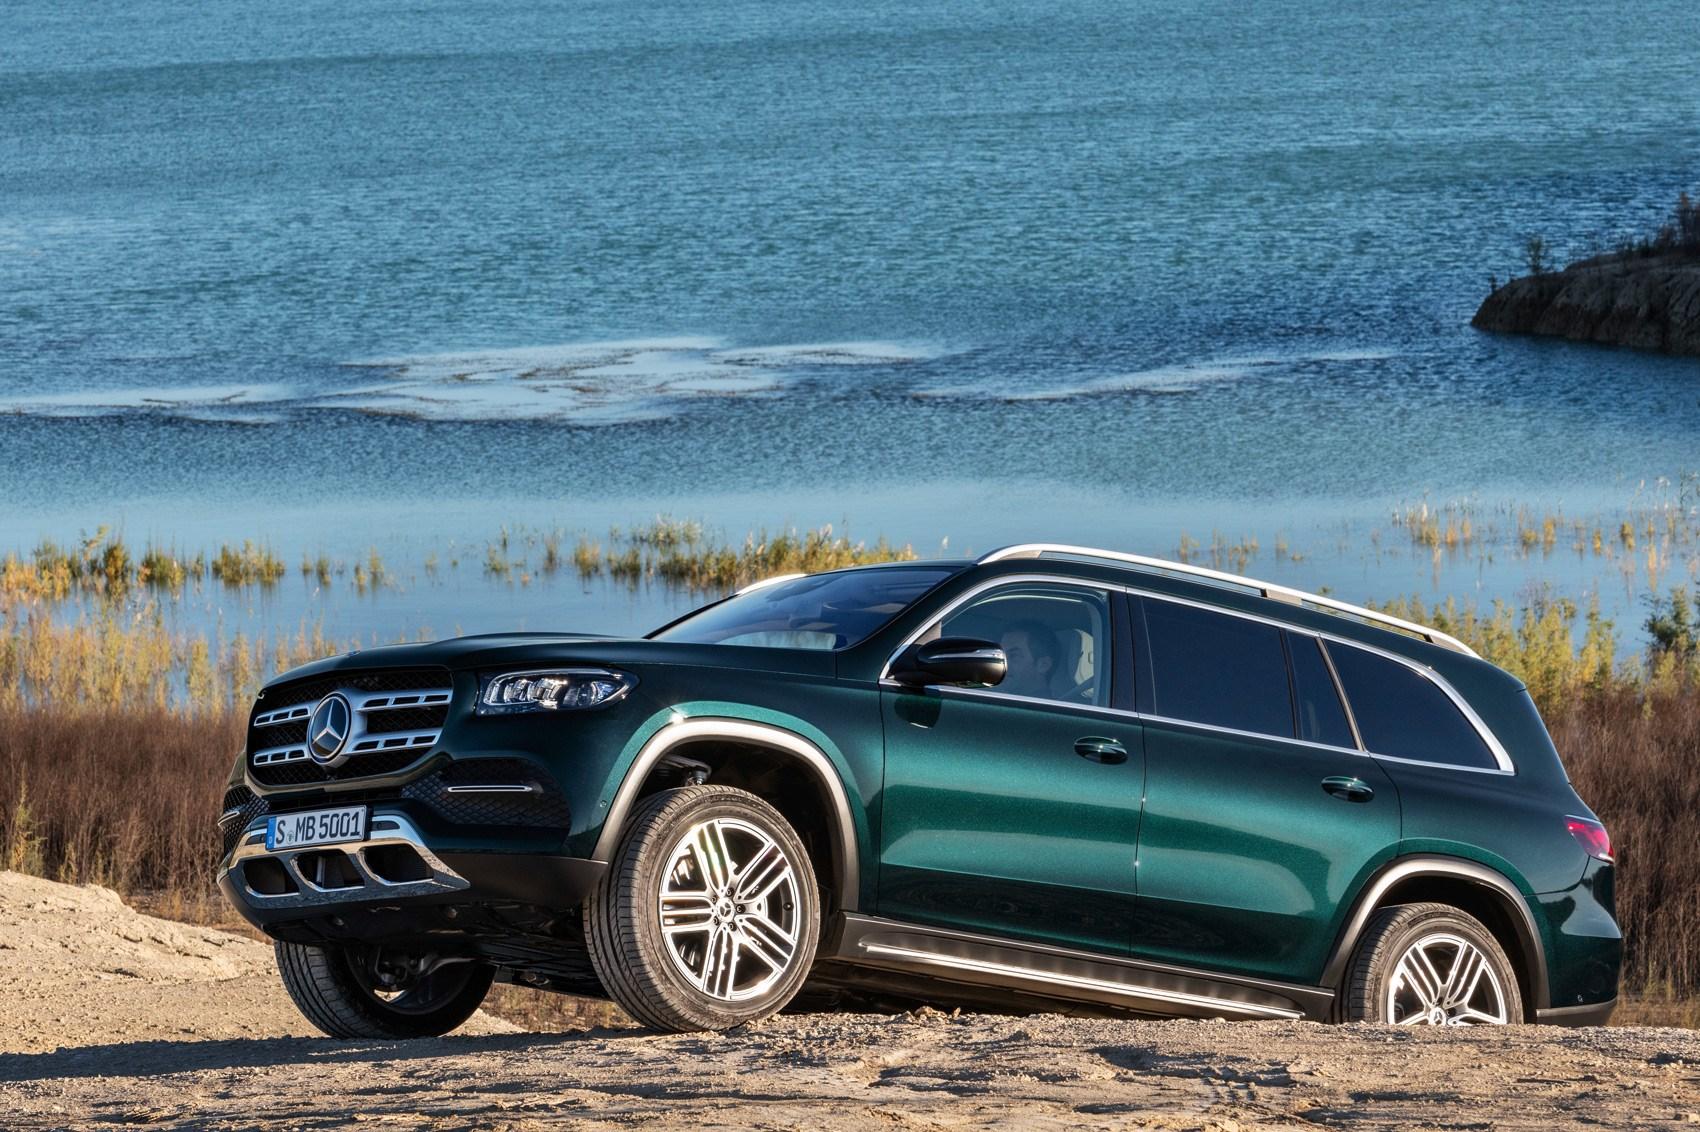 All-new Mercedes GLS SUV rolls into New York | CAR Magazine